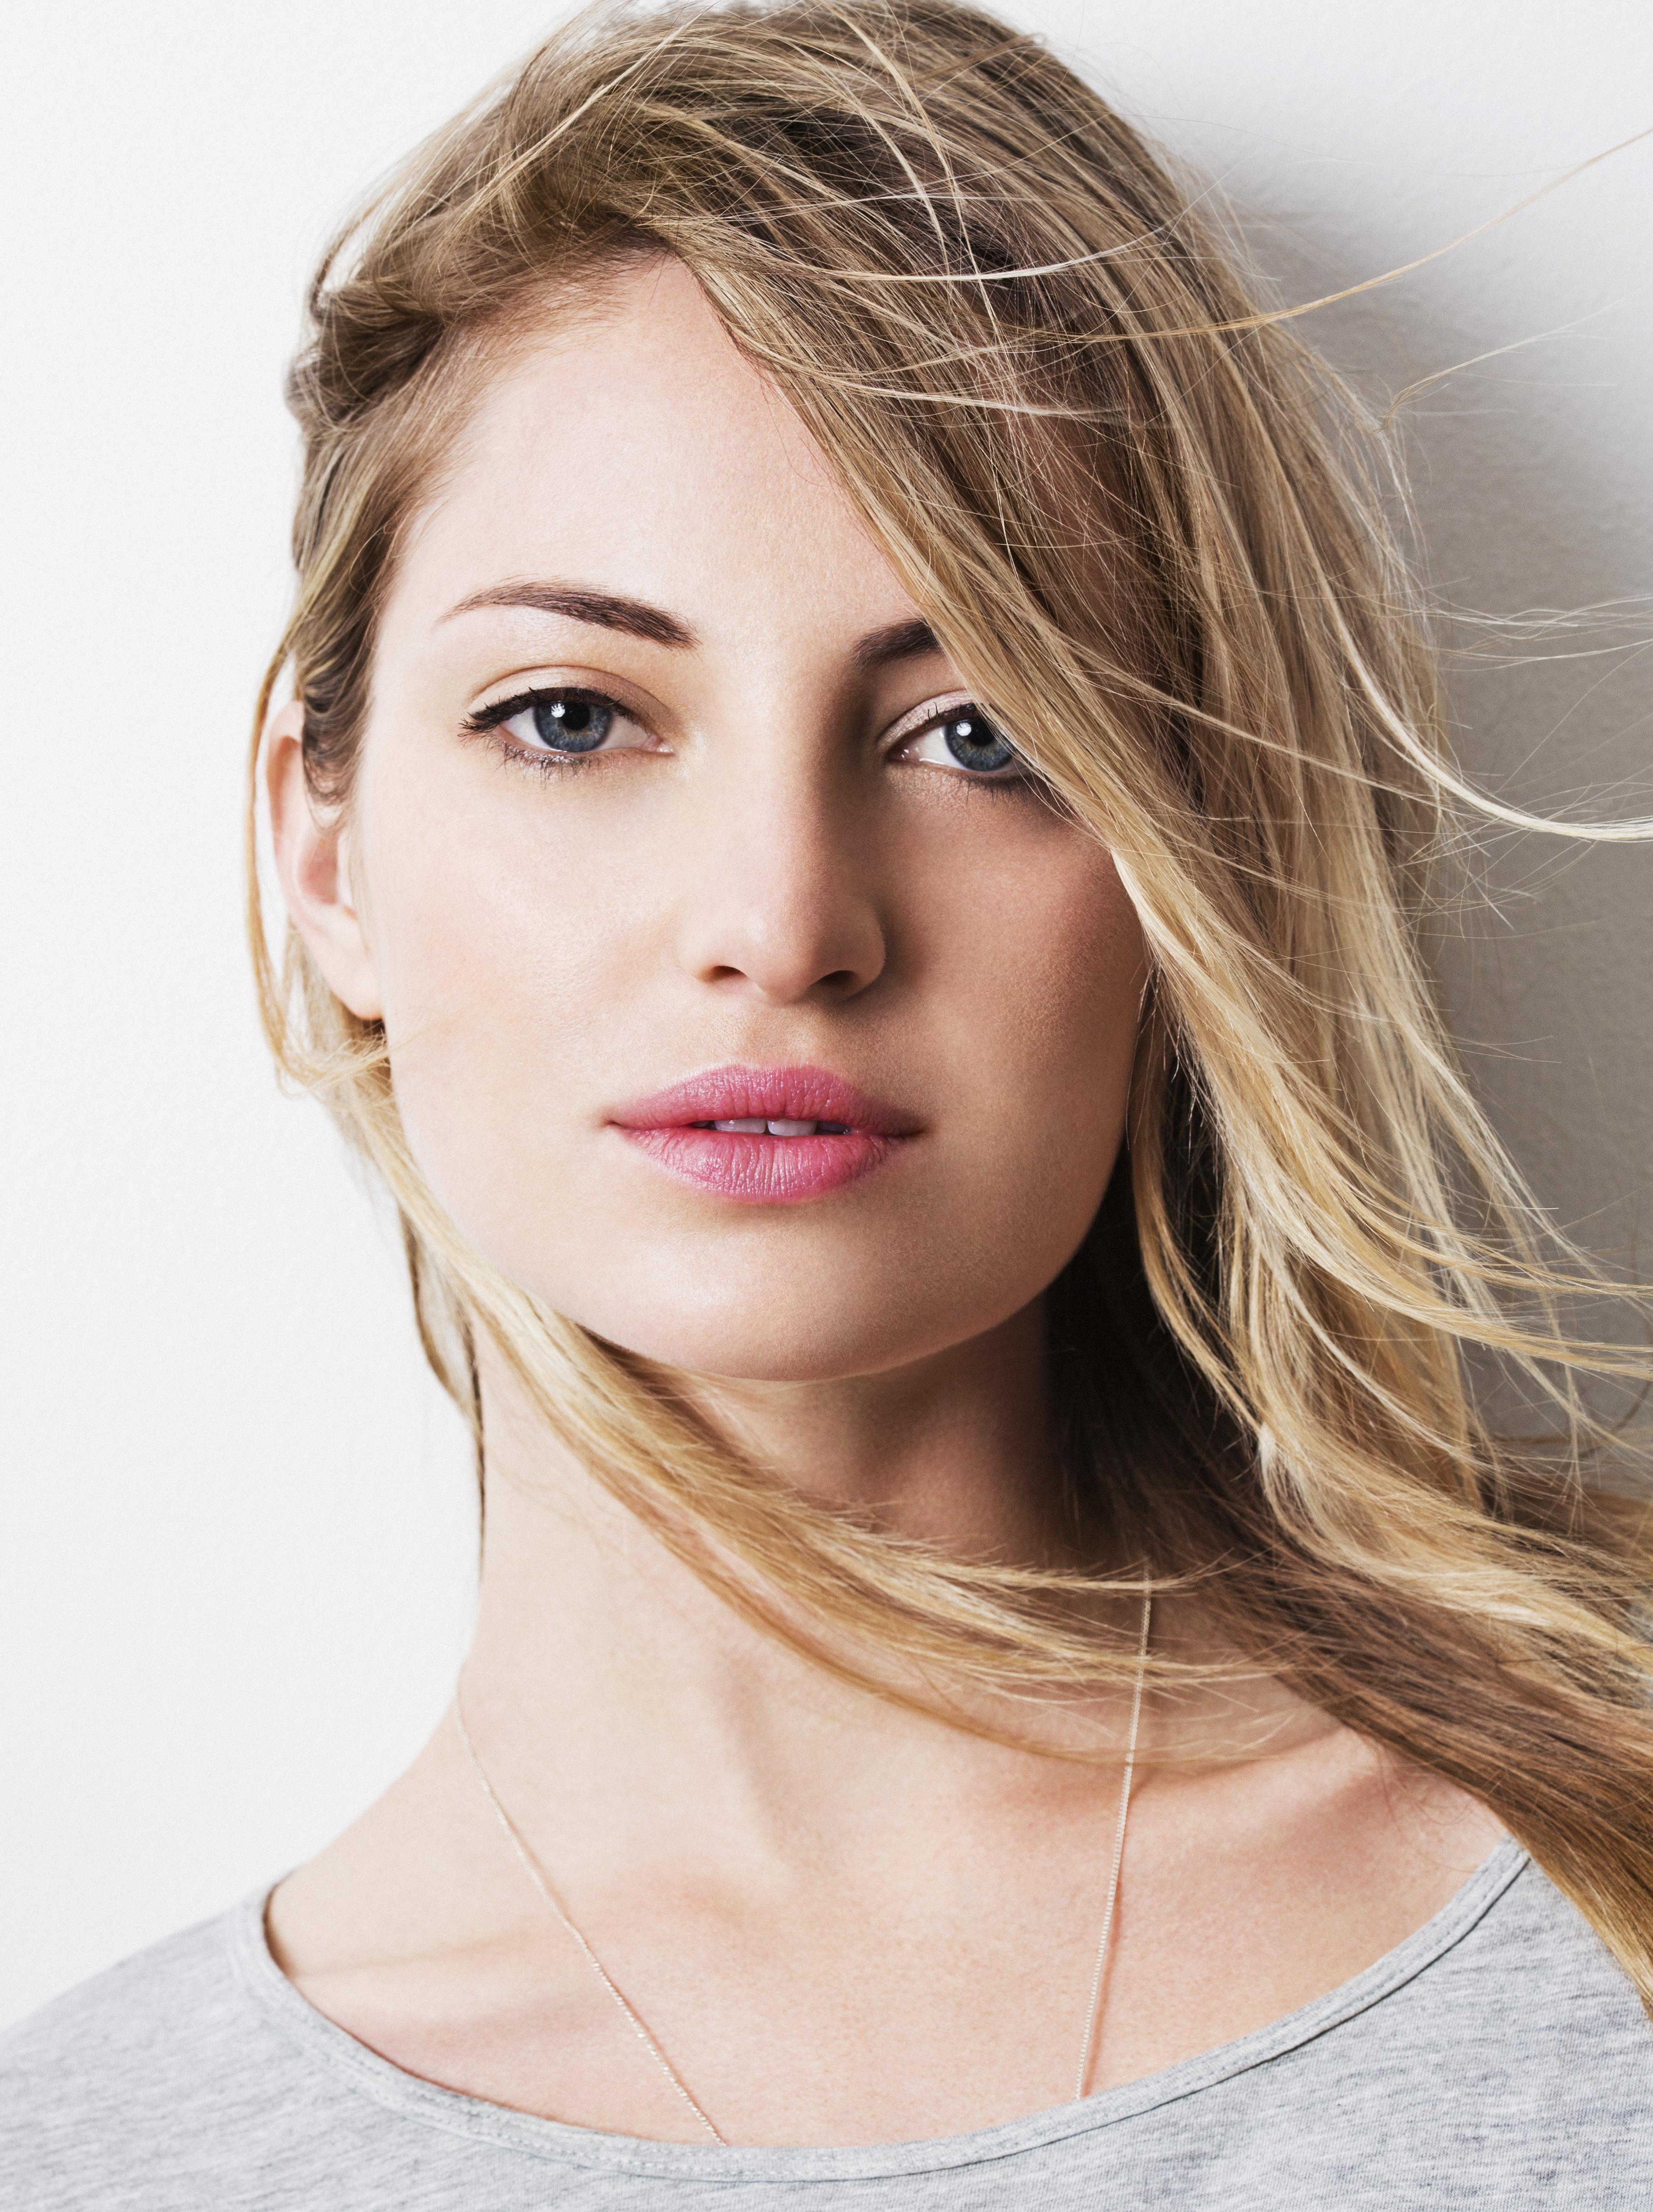 natural blonde woman